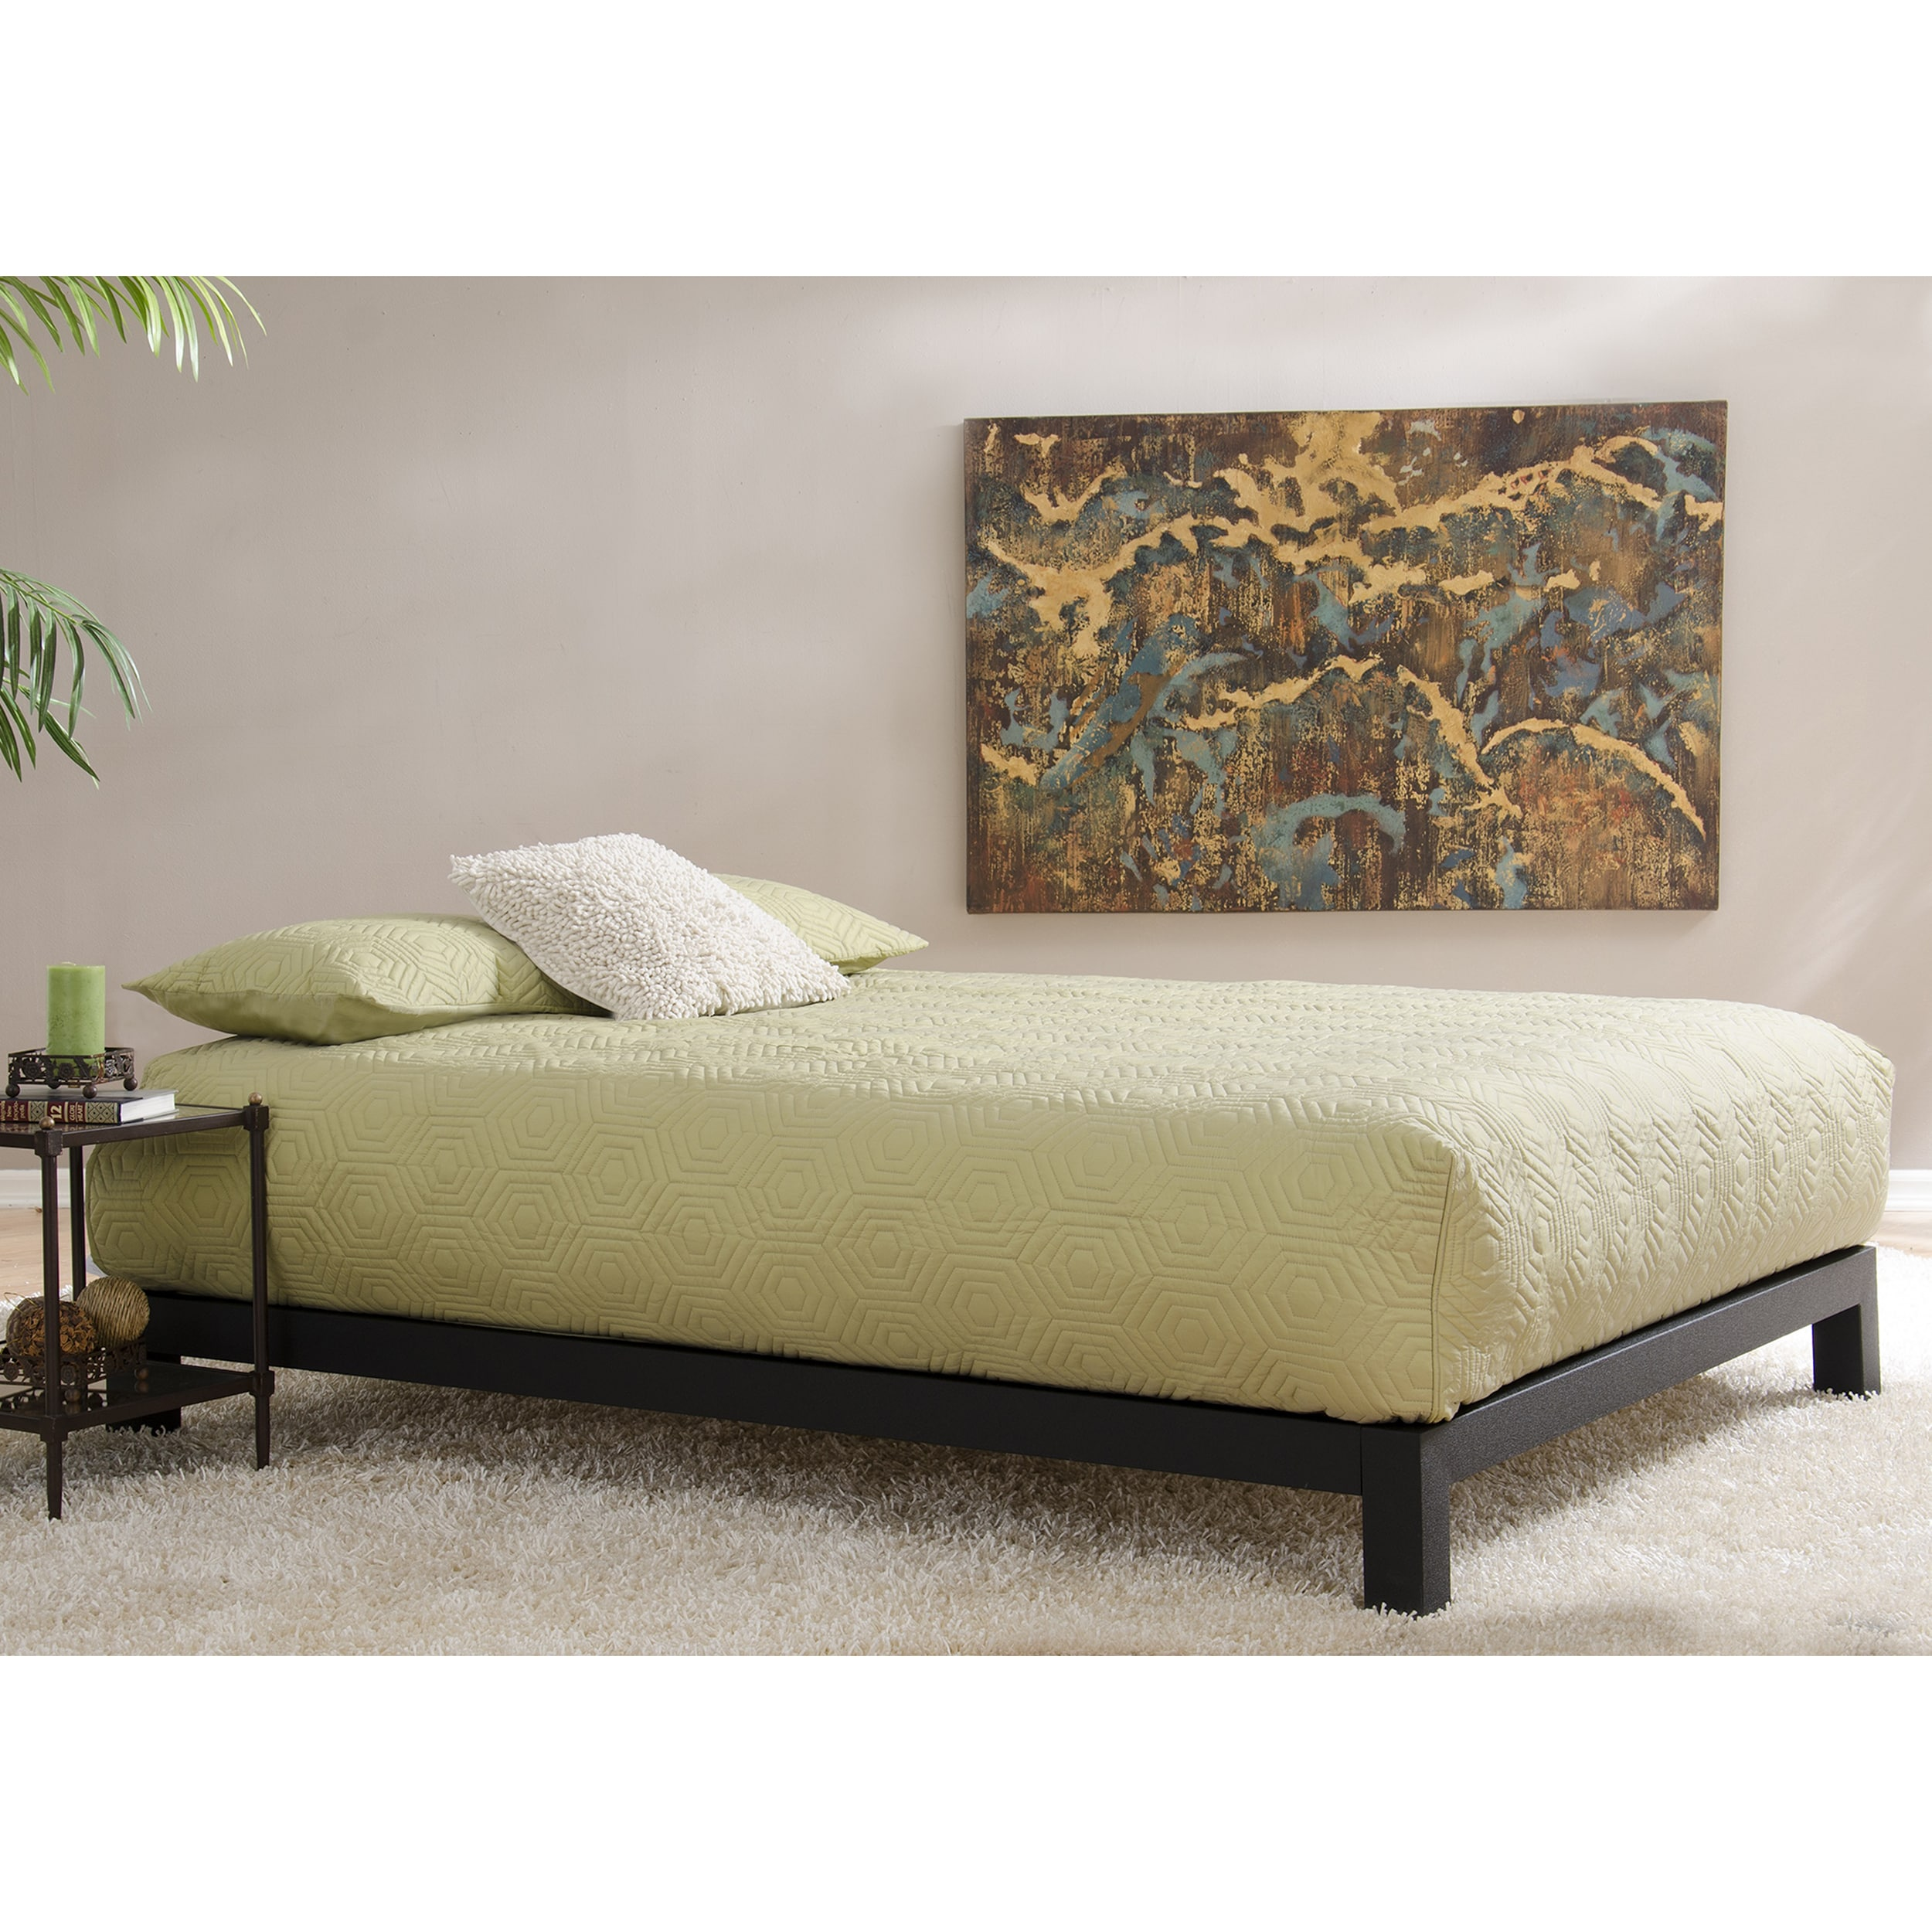 Shop Motif Design Aura Deluxe Platform Bed Black Free Shipping